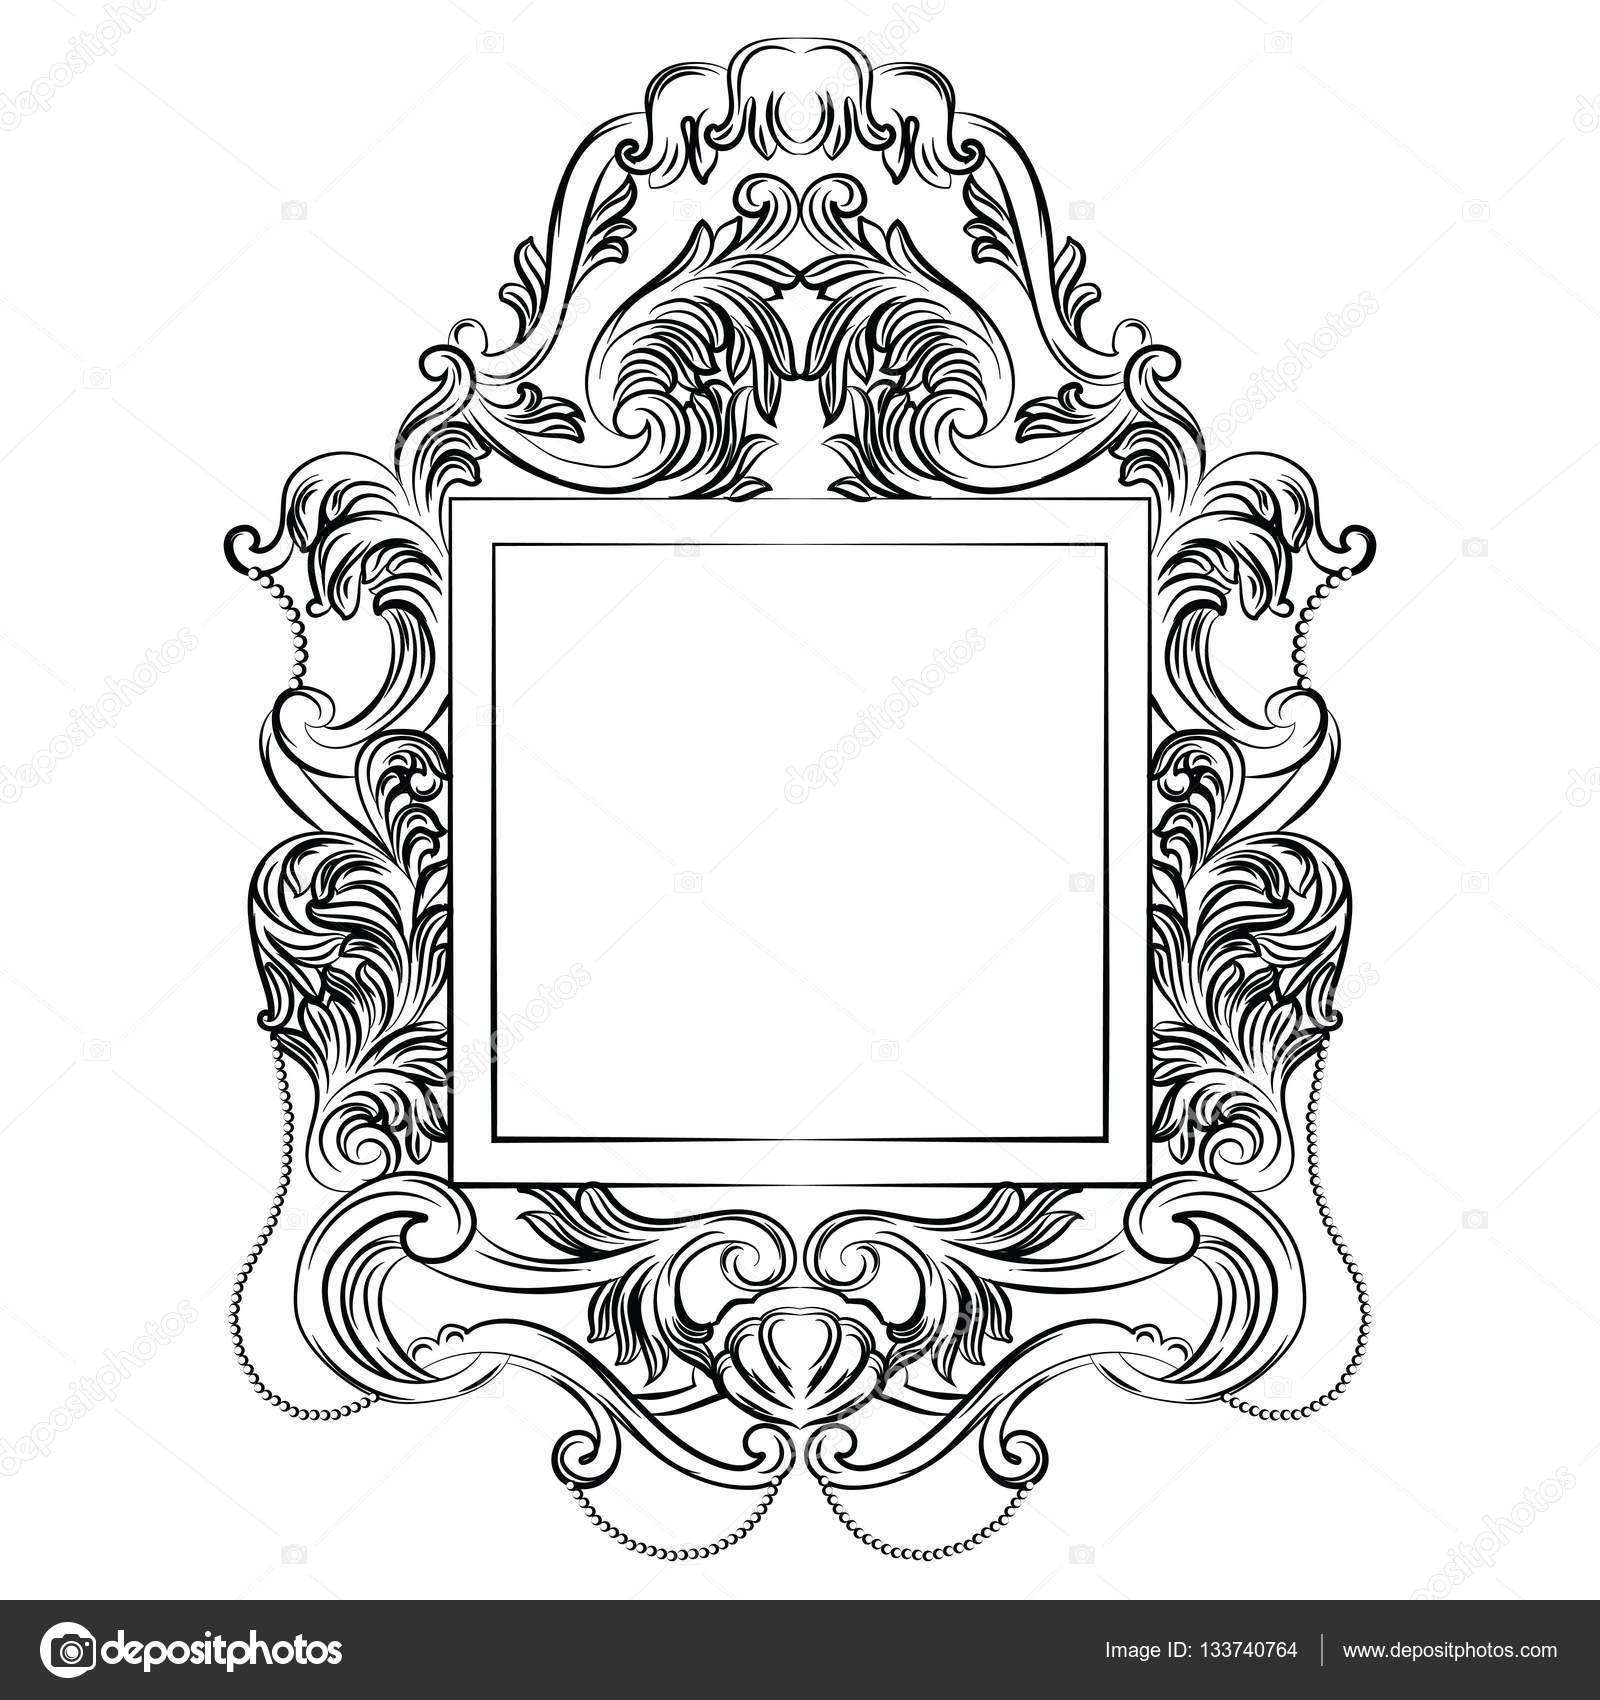 Exquisite fabelhafte Imperial Barock-Spiegel-Rahmen — Stockvektor ...